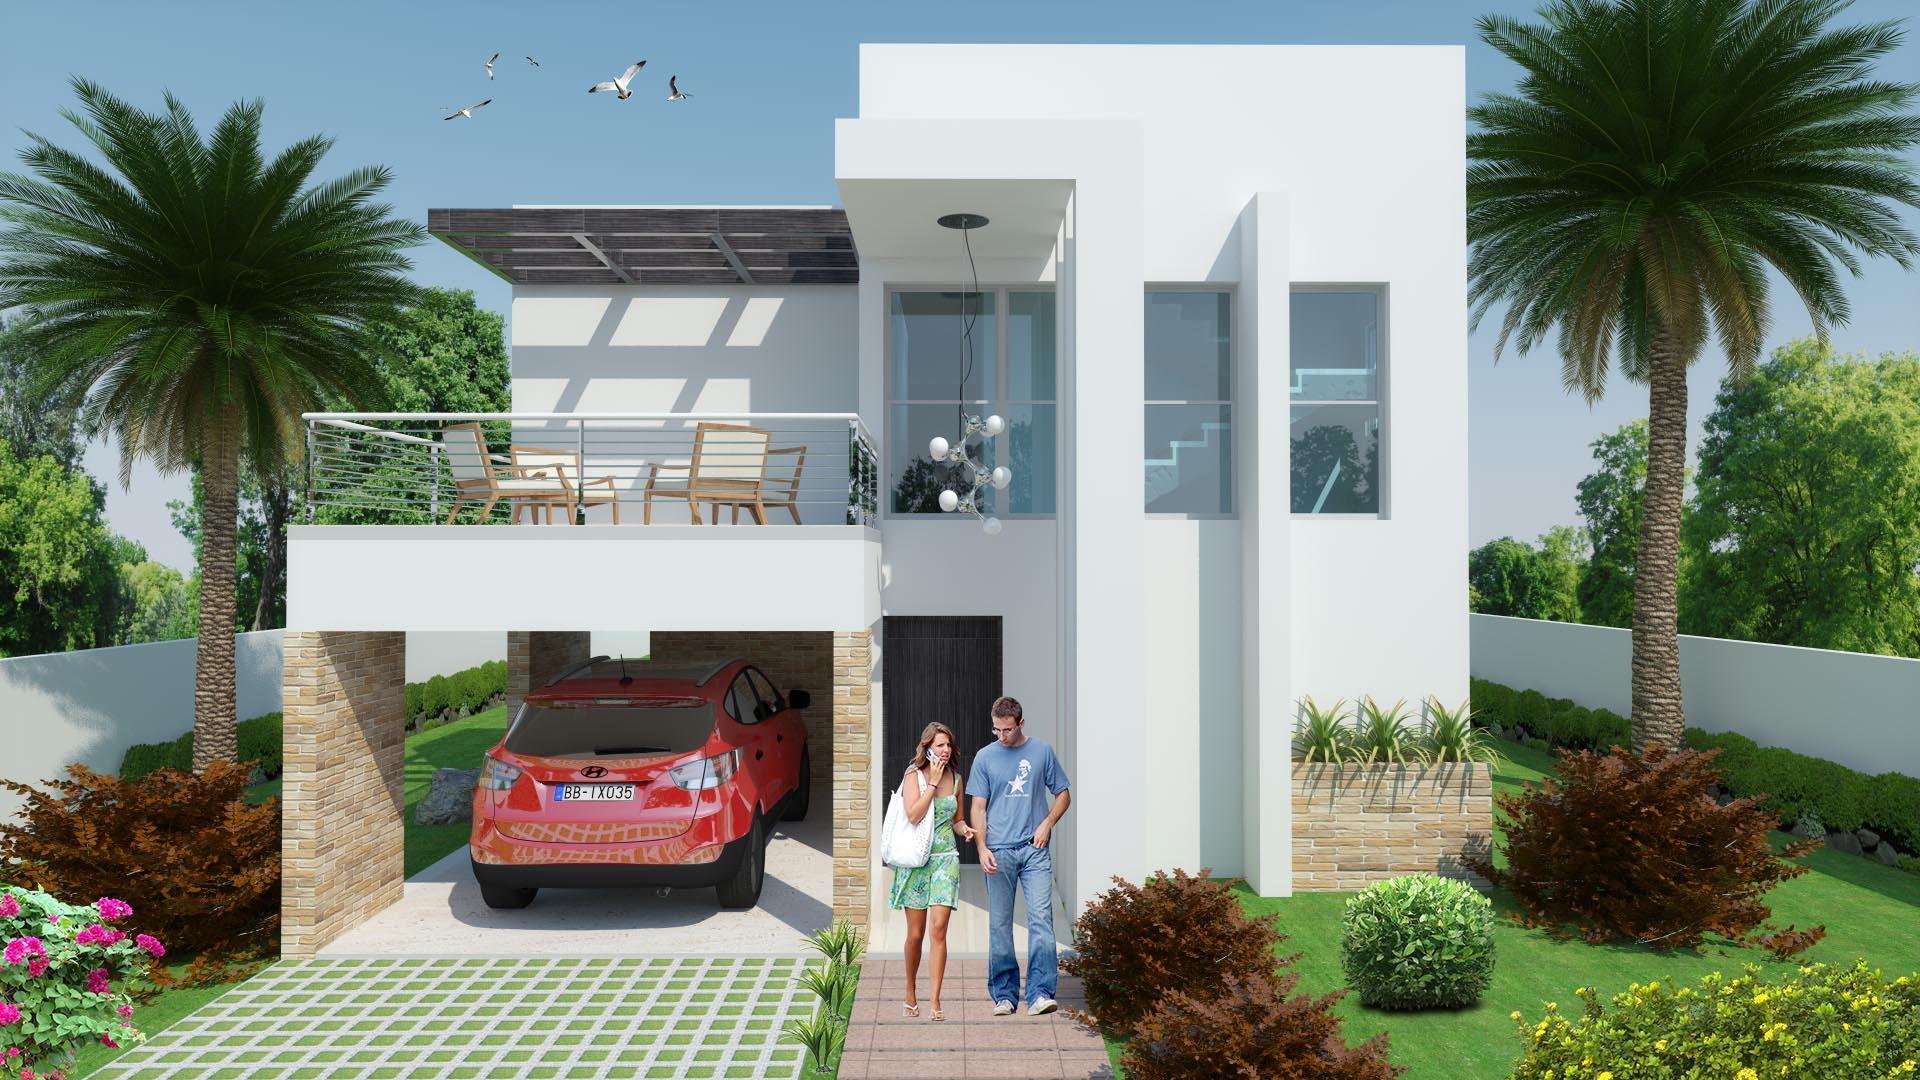 2 Bedrooms Villa for sale Sosua – Villa Onix